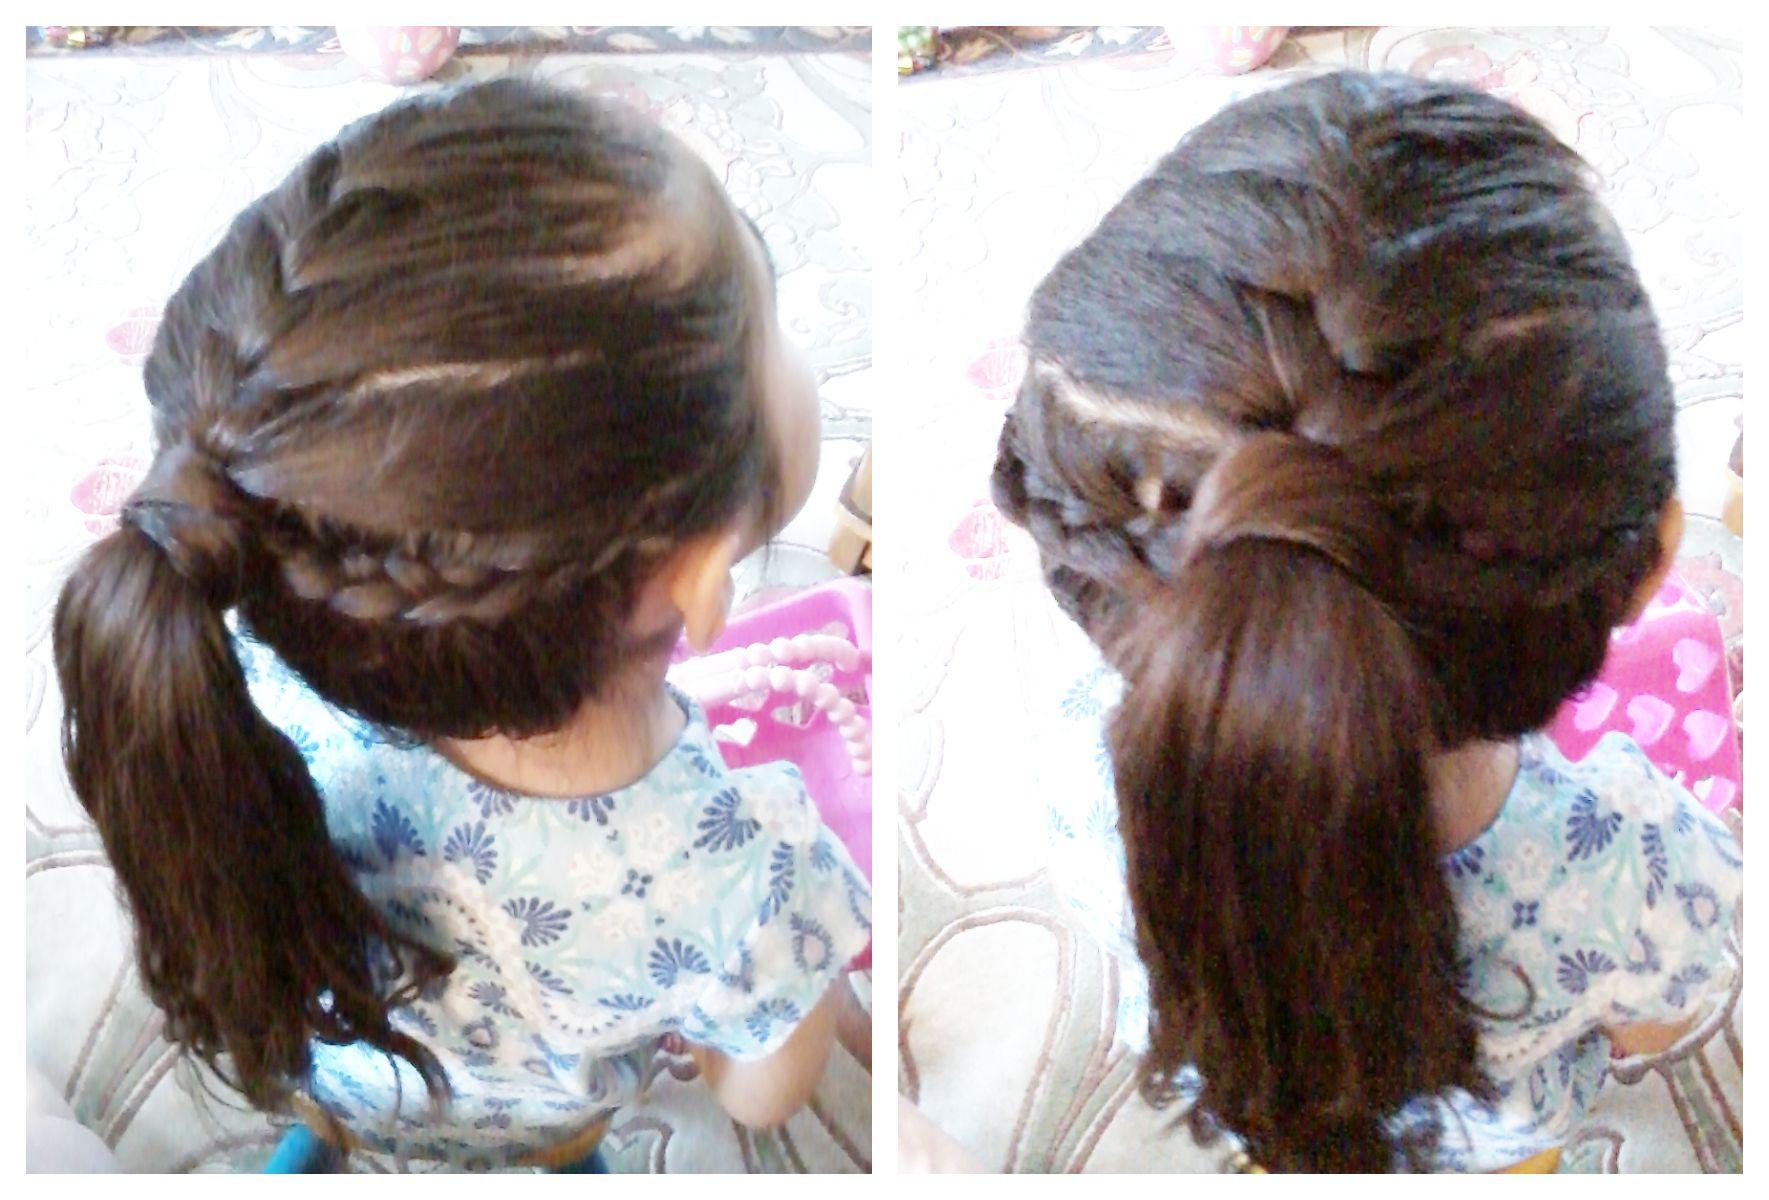 French Braid W 2 Lace Braids Into Ponytail Lace Braids Hair Styles Braided Ponytail